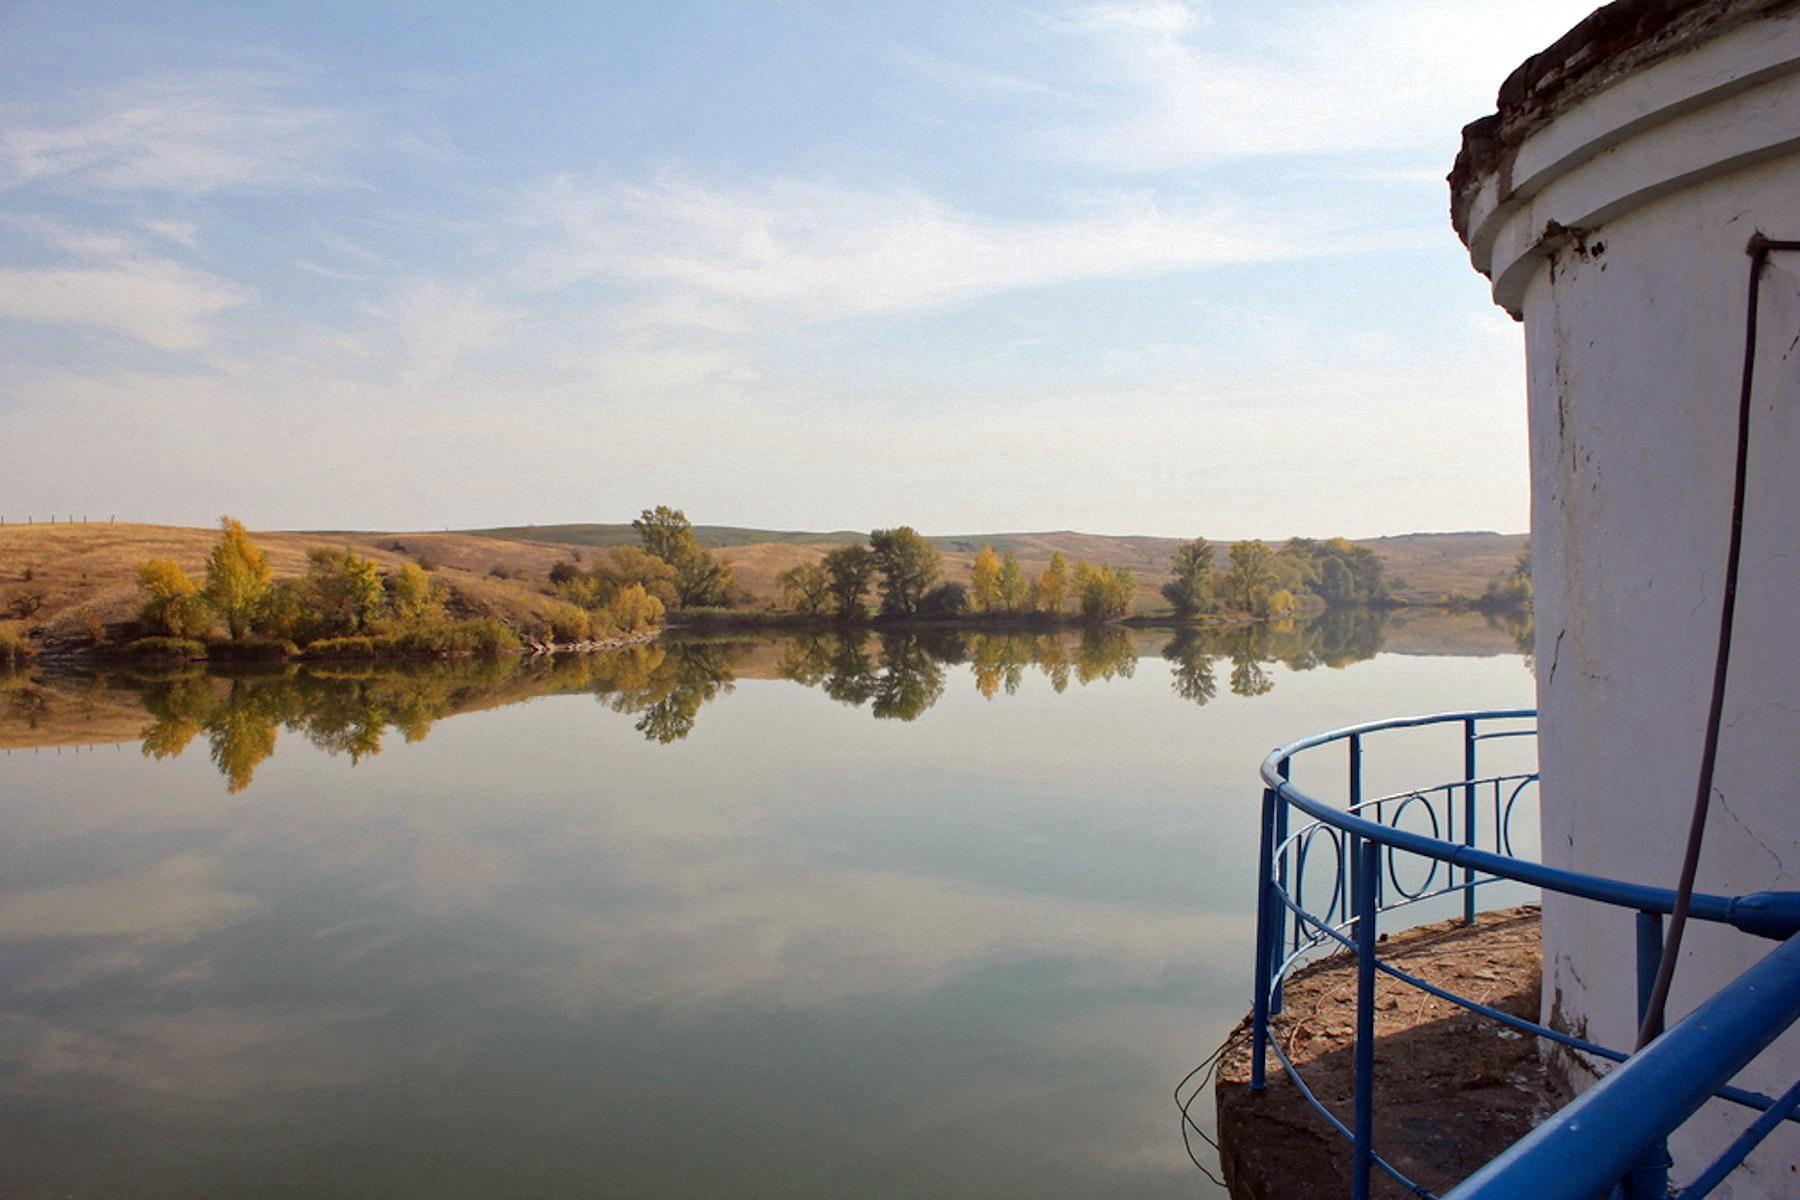 00 lnr reservoir lugansk pr 03 091015